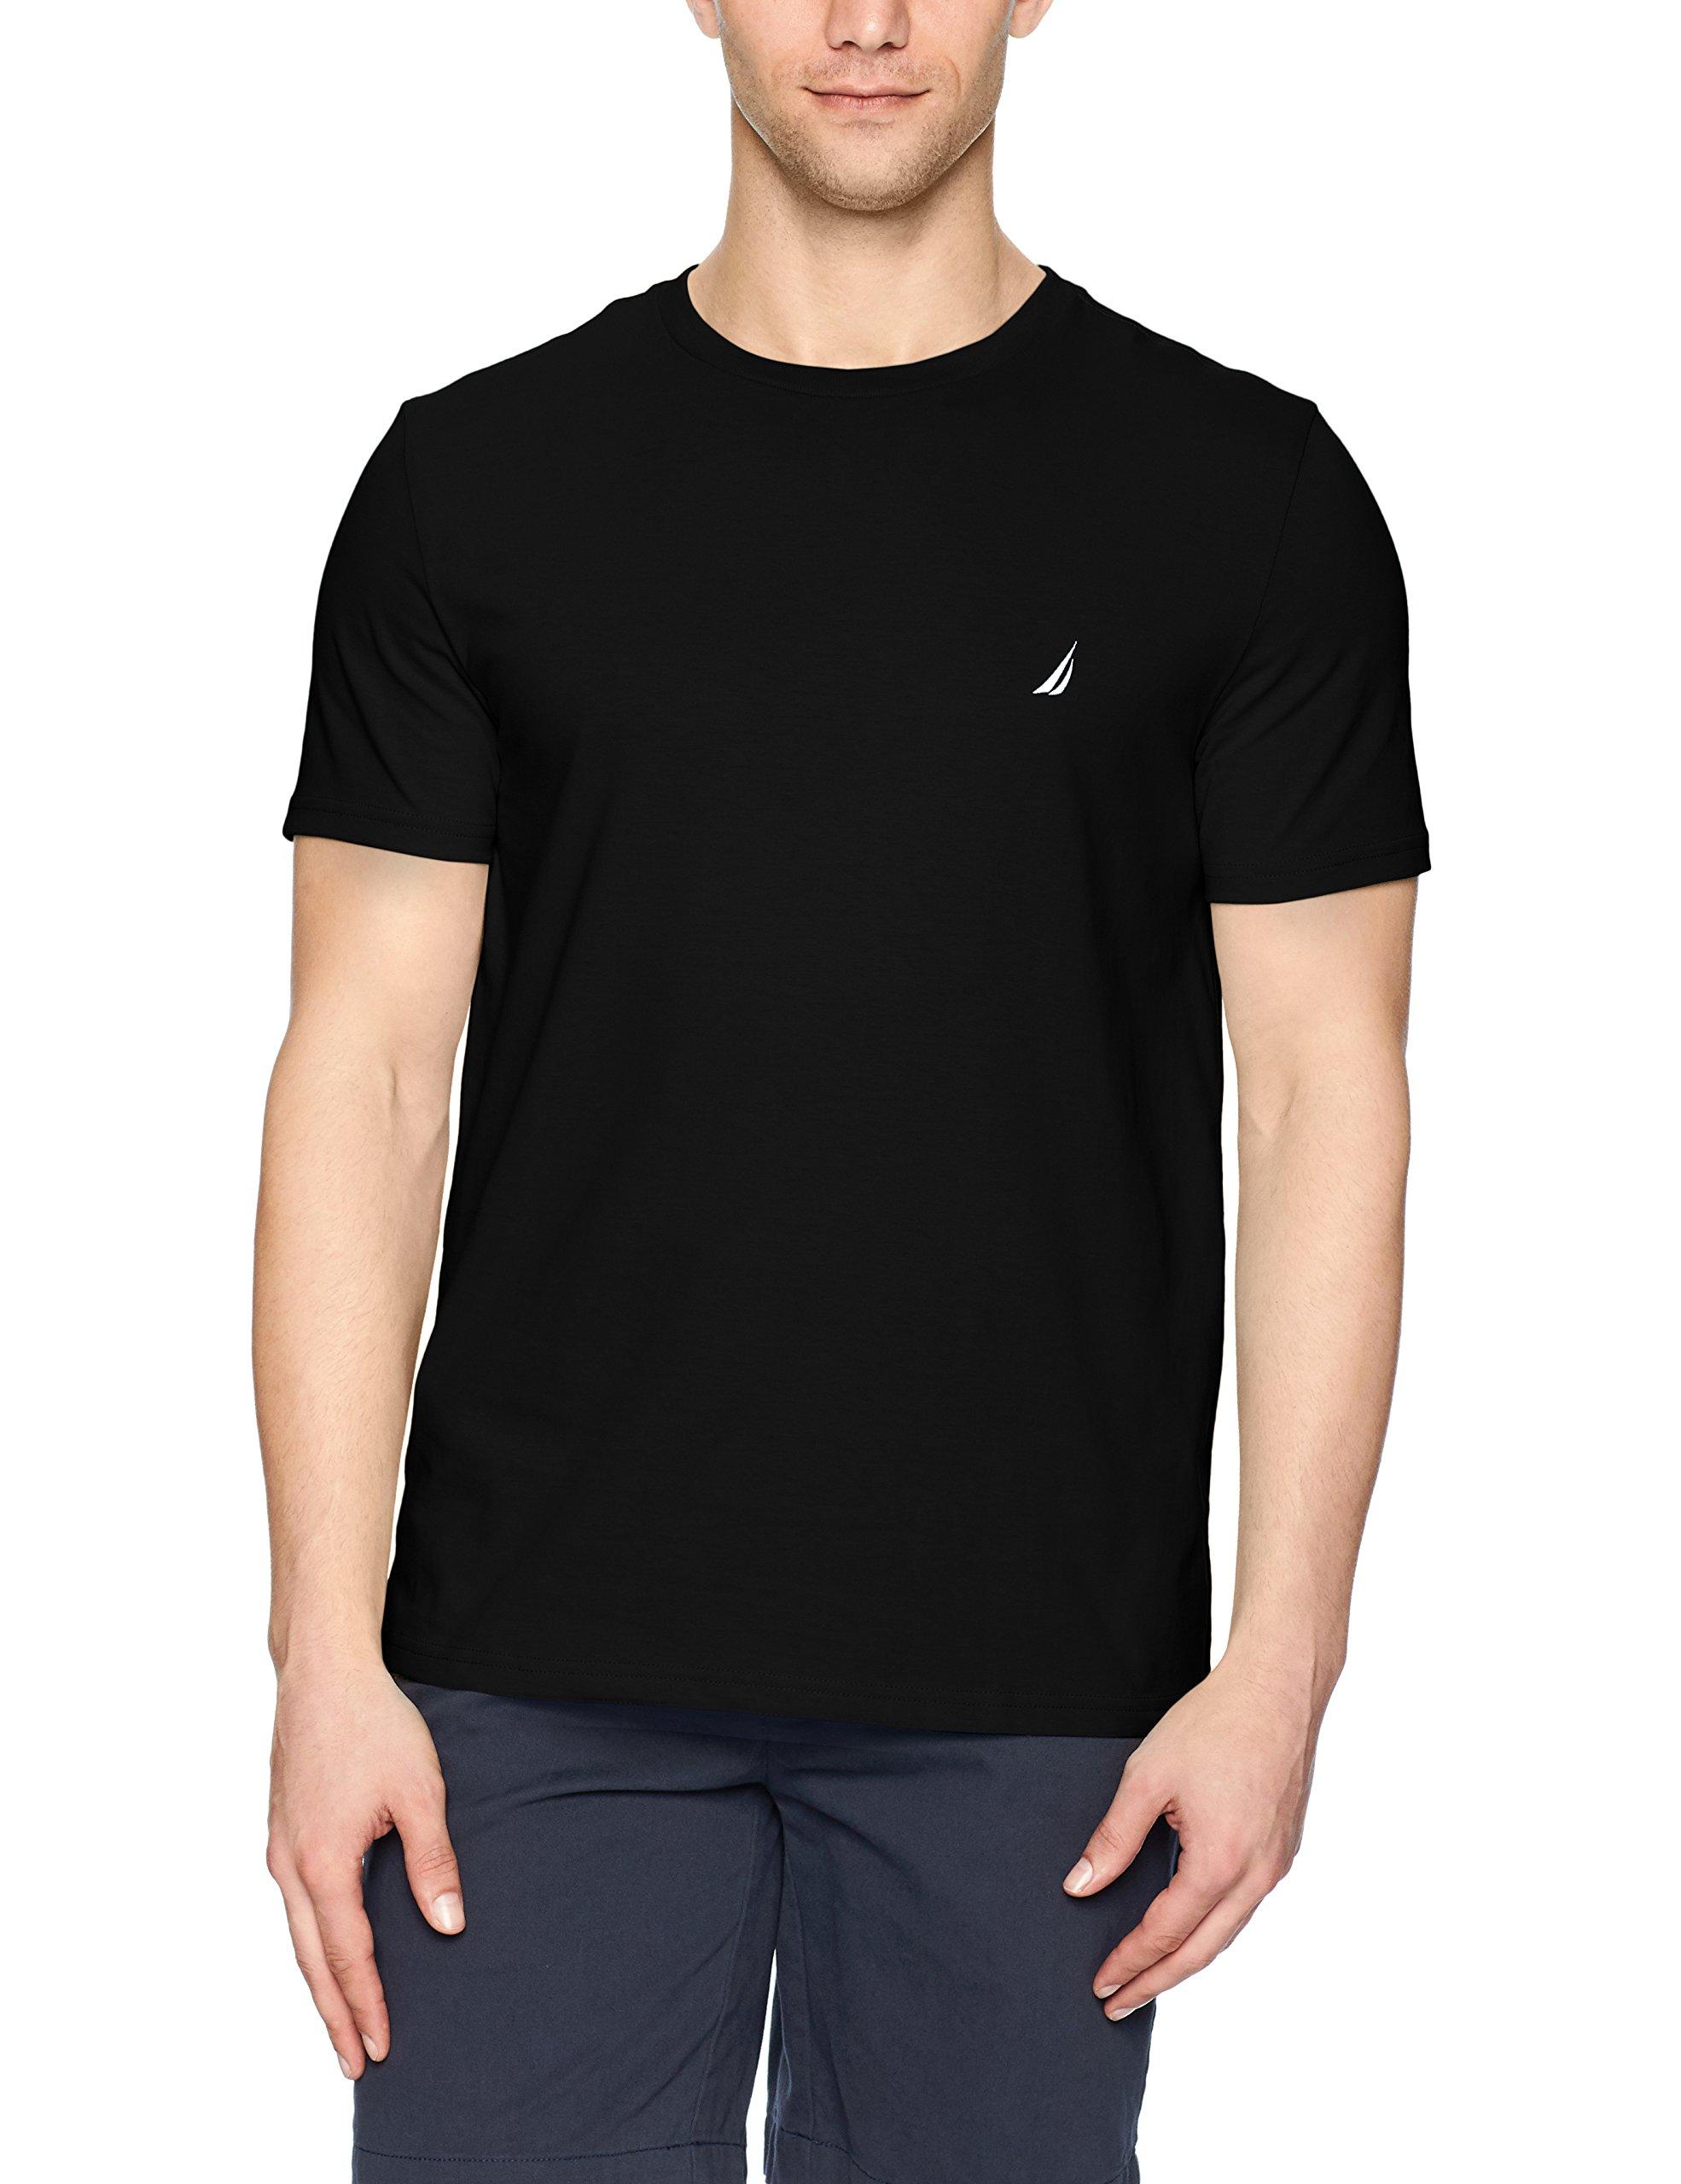 Nautica Men's Short Sleeve Solid Crew Neck T-Shirt, True Black Solid, Large